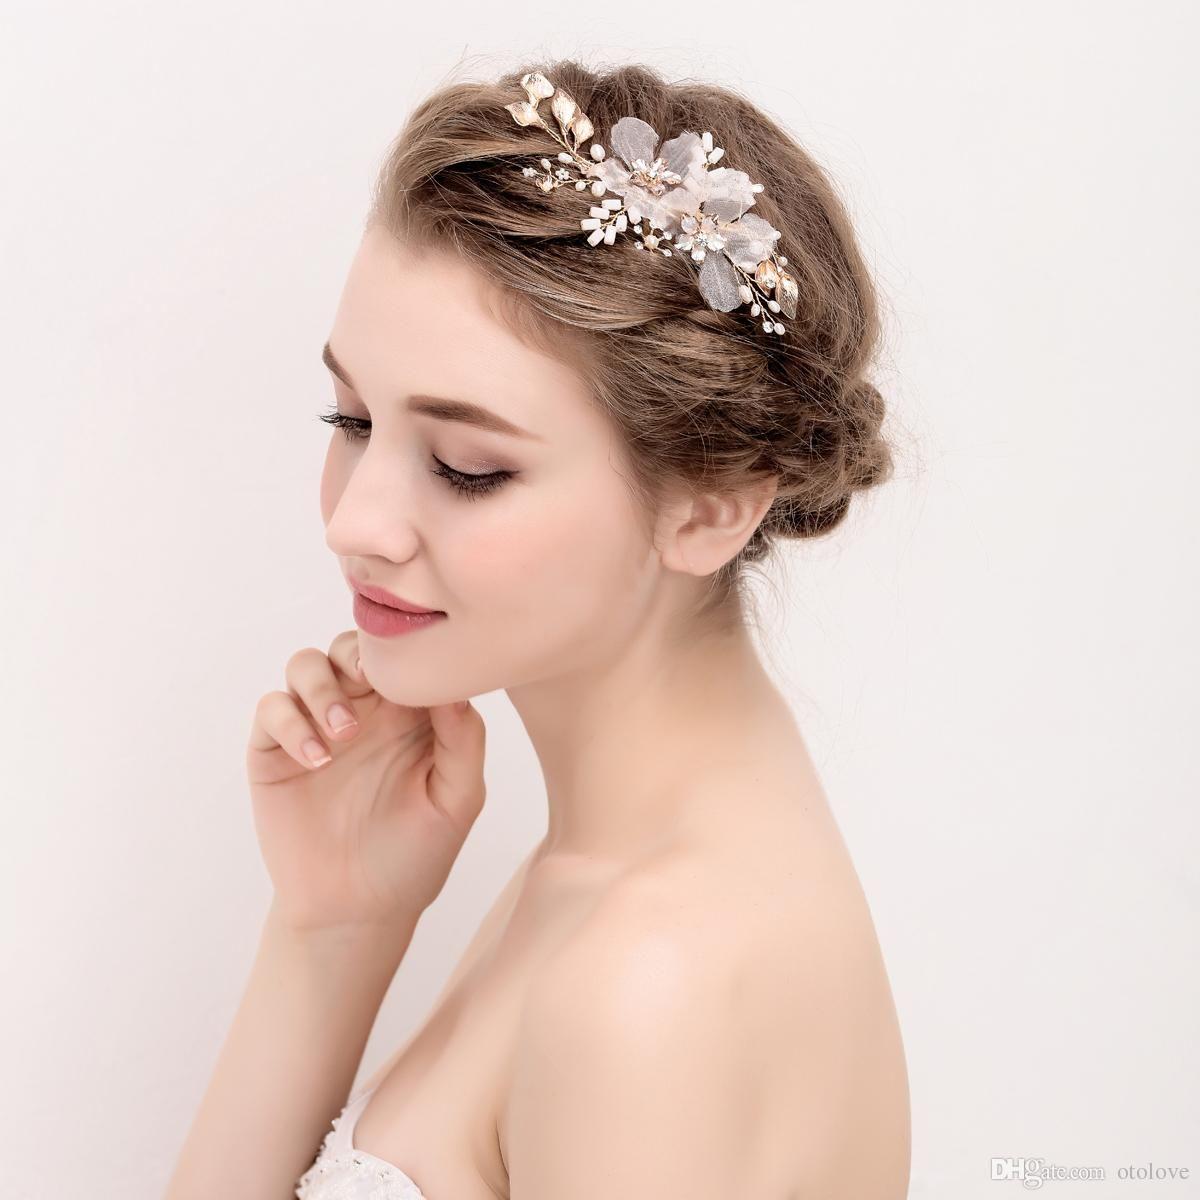 wholesale handmade bridal headpiece ivory & blush pink